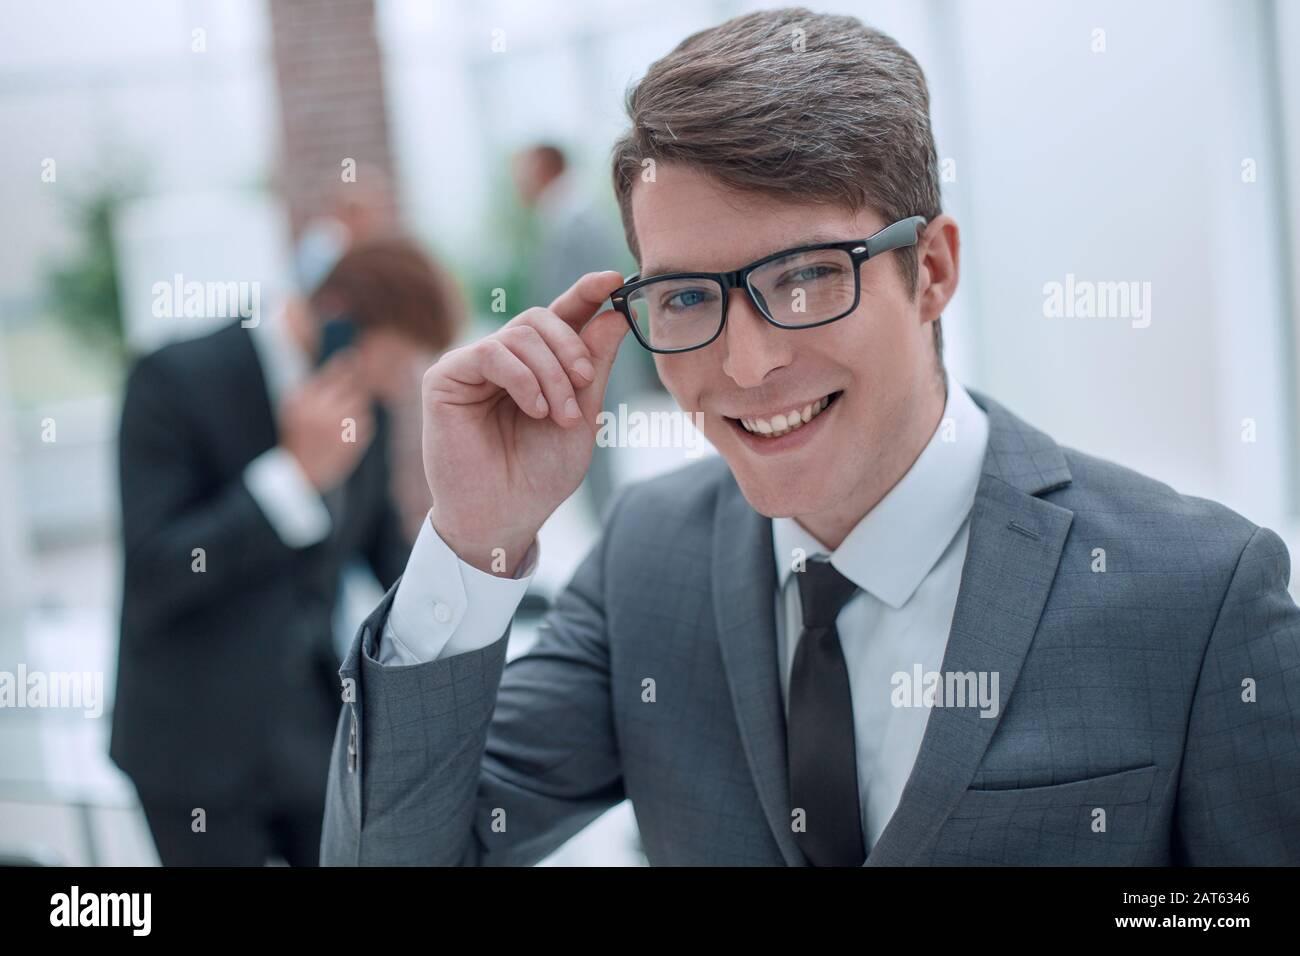 hombre de negocios responsable mirando a través de sus gafas. Foto de stock